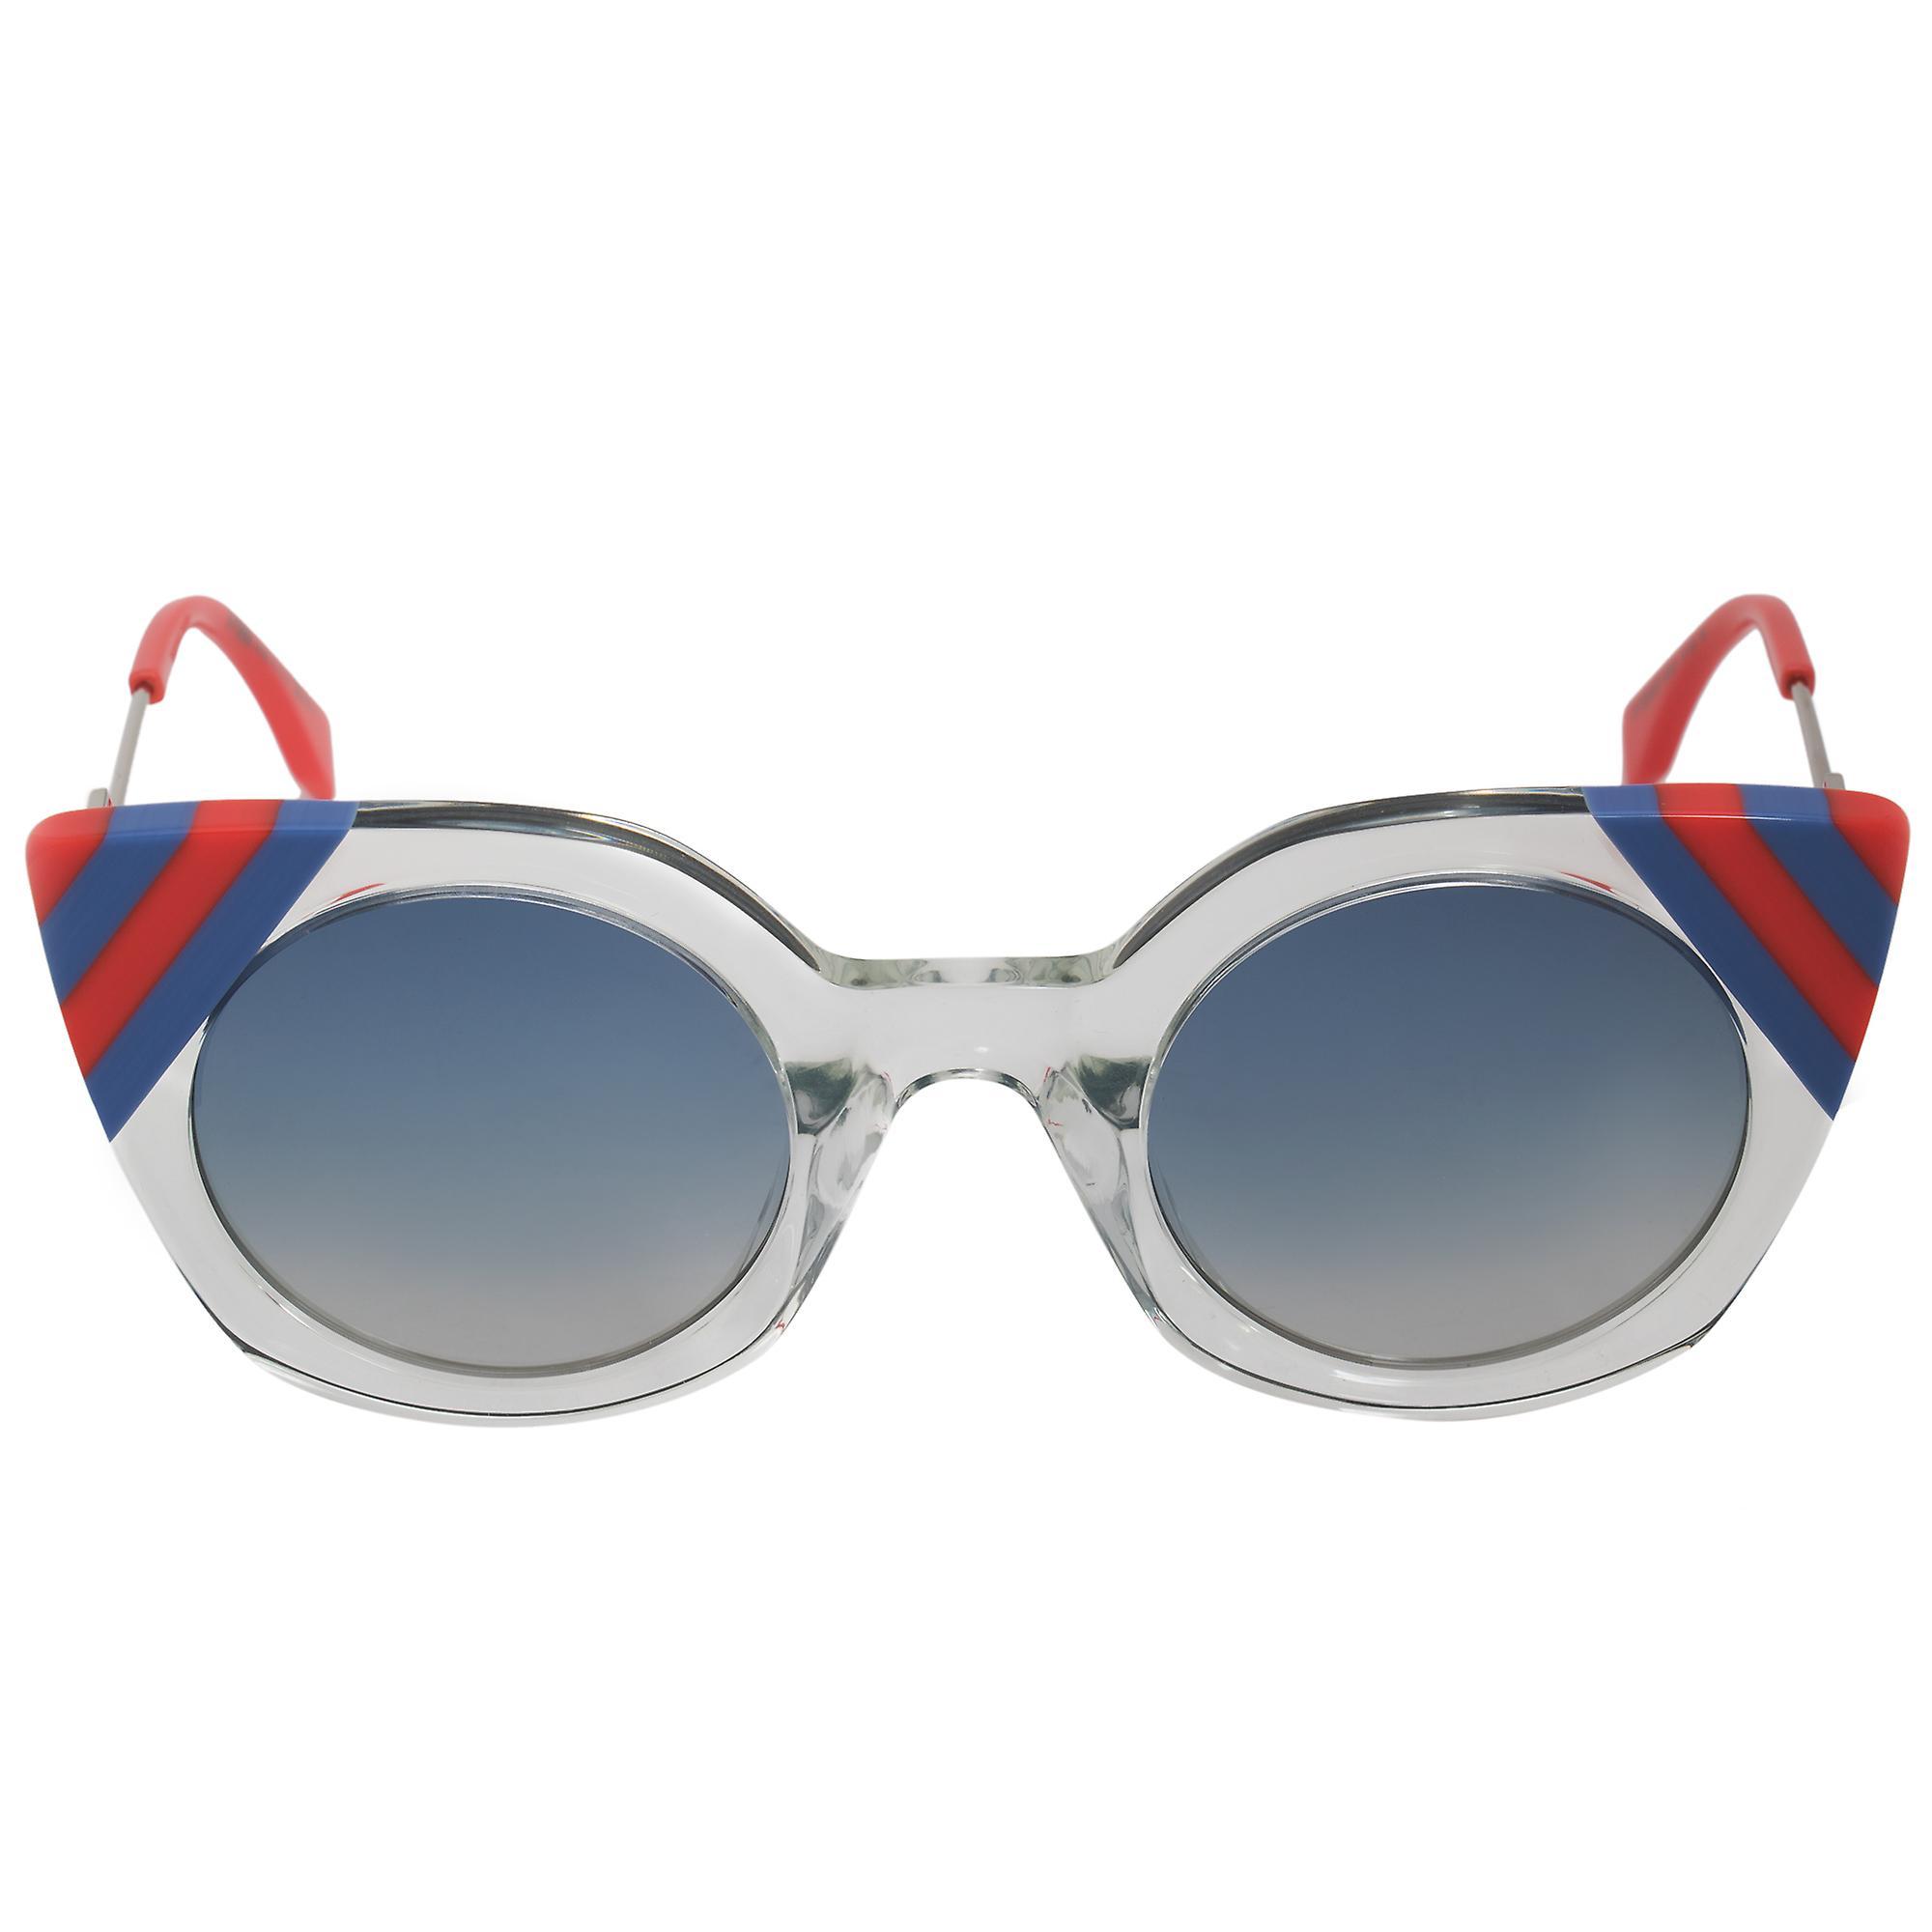 c01654e5132 Fendi Fendi Waves Butterfly Sunglasses FF0240S 1ED UY 47